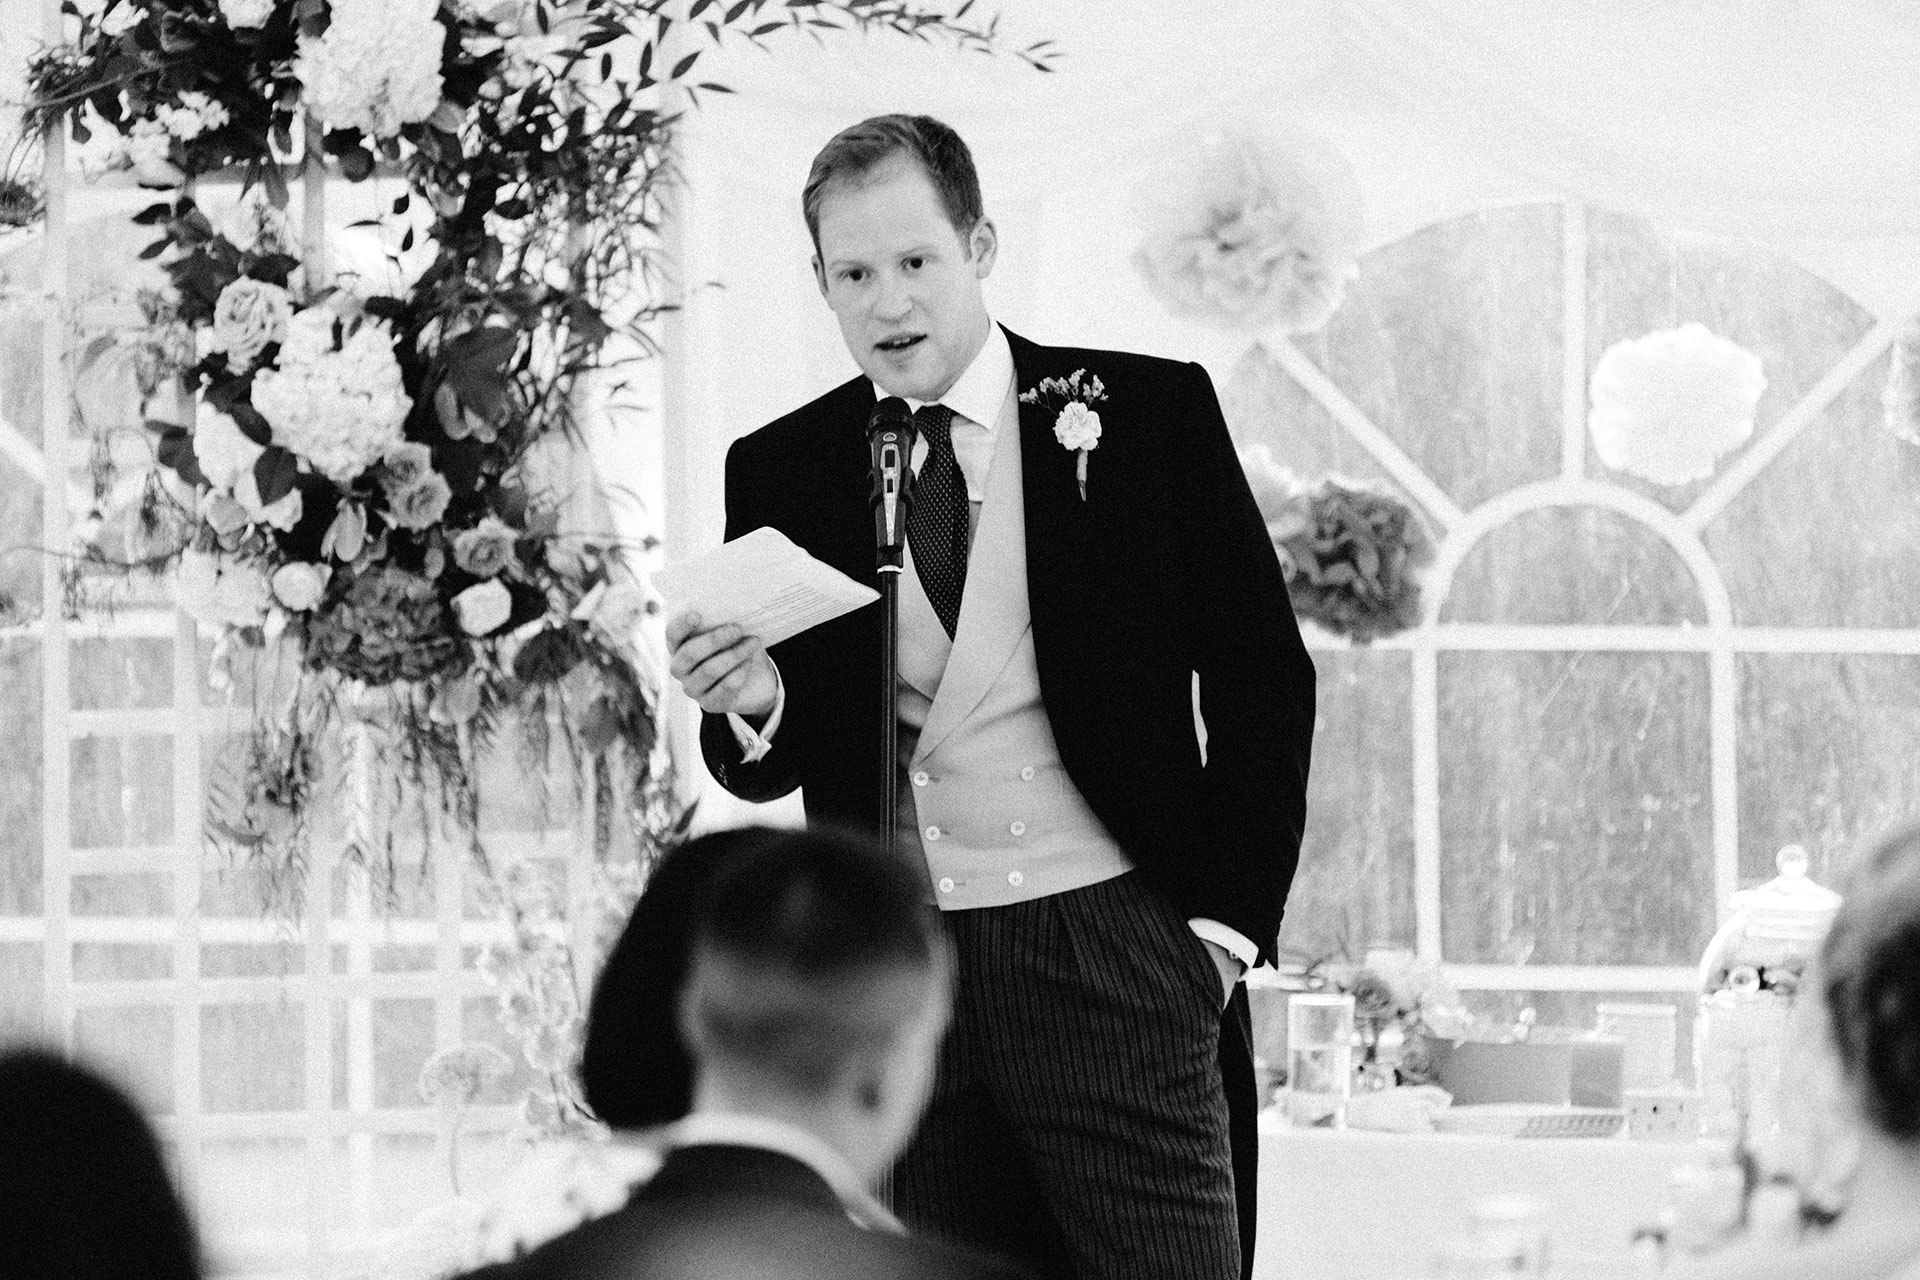 Langar-Hall-wedding-photographer-in-Nottinghamshire-Michael-Newington-Gray-98.jpg